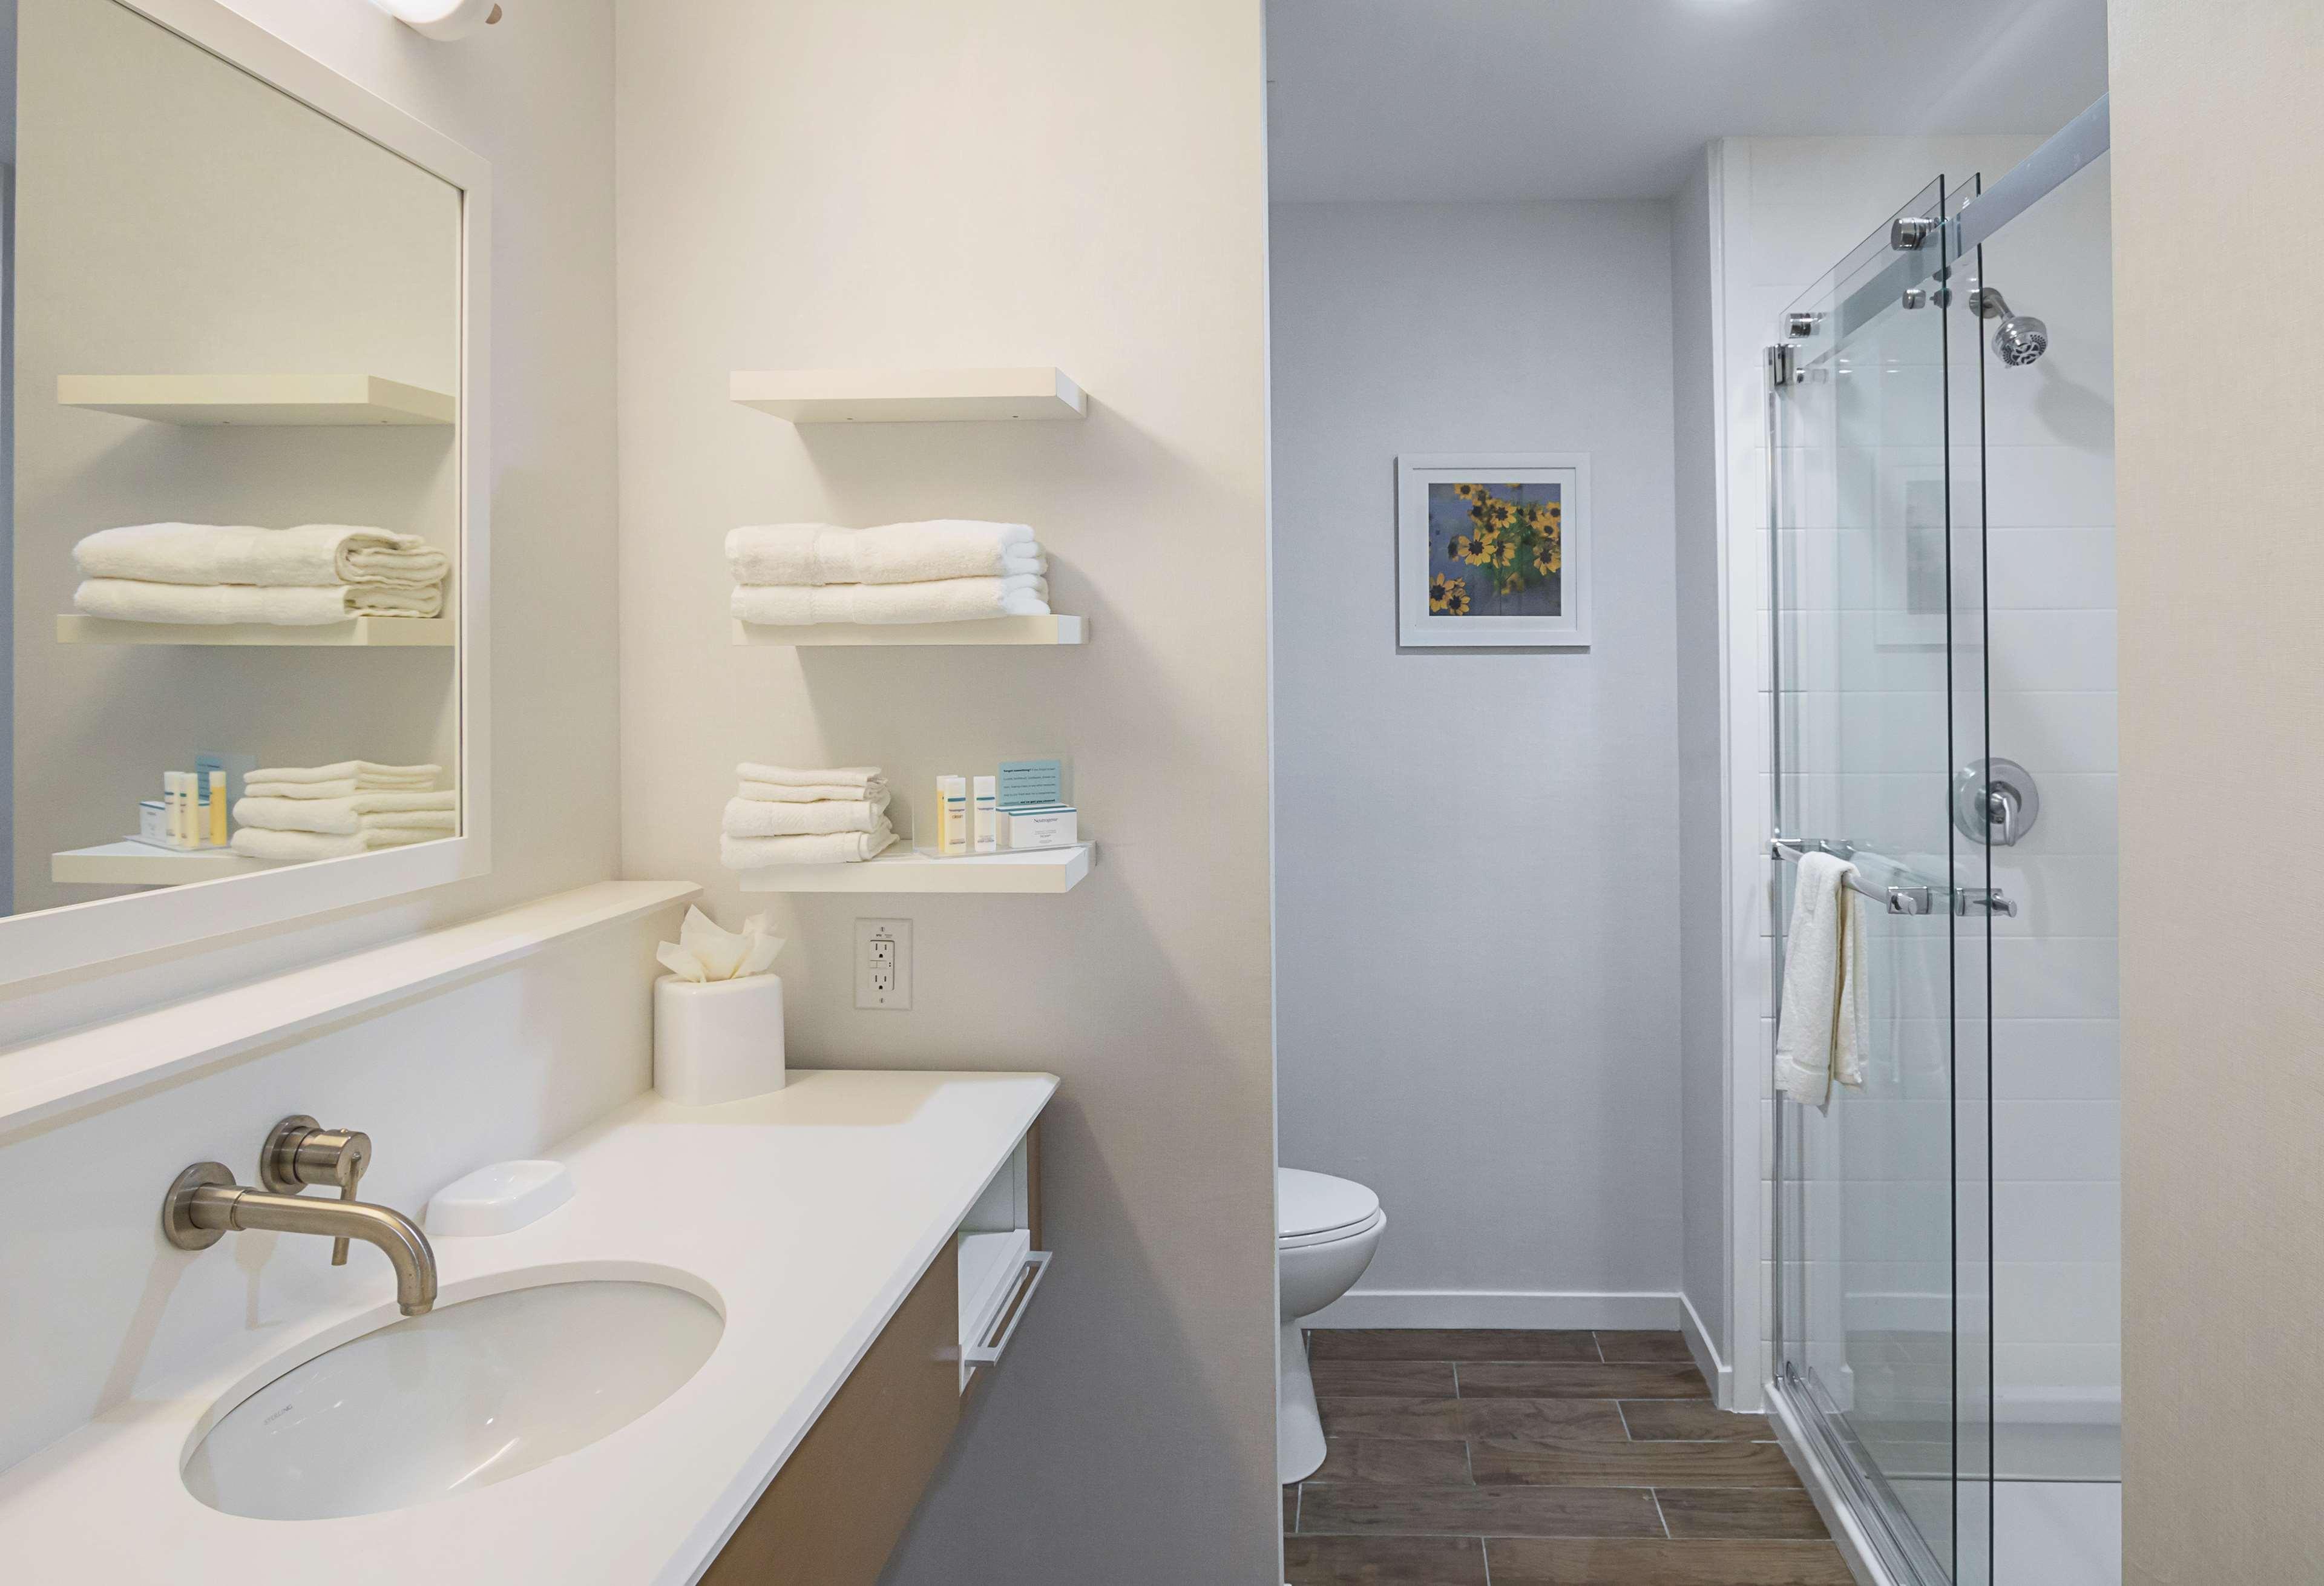 Hampton Inn & Suites Colleyville DFW West image 25